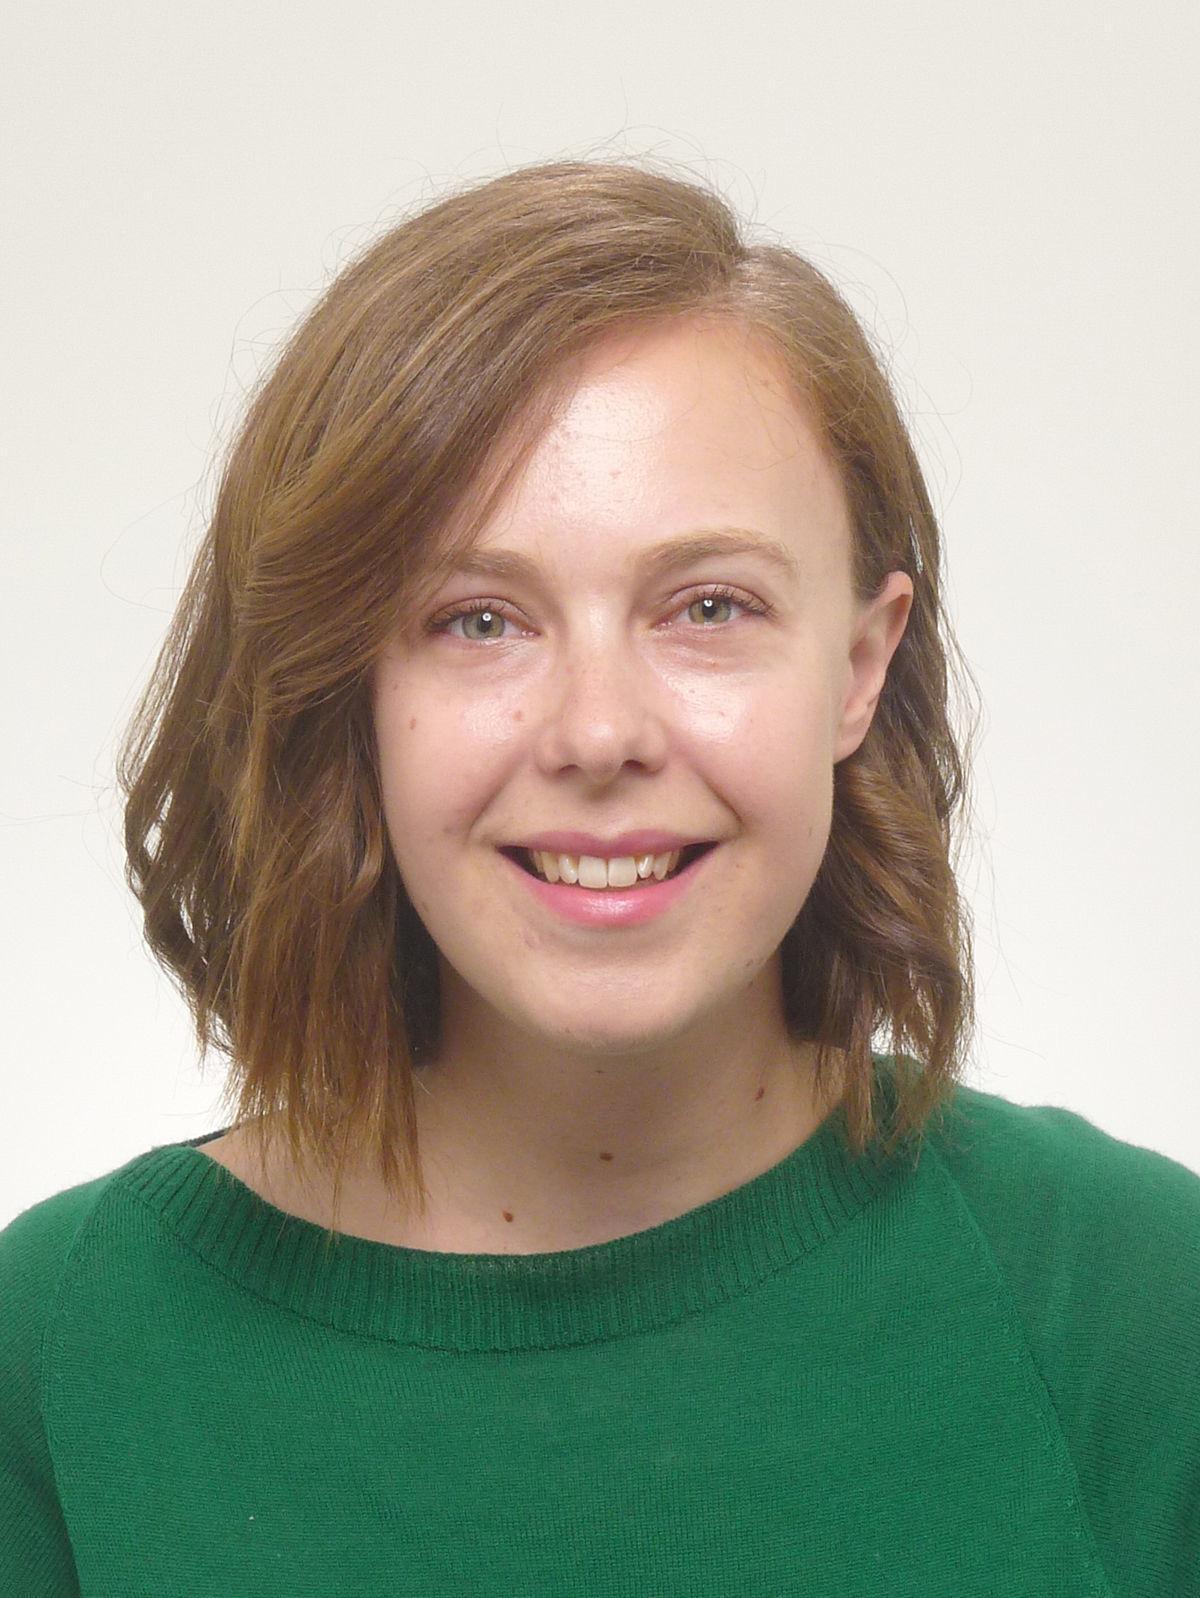 Megan Meller